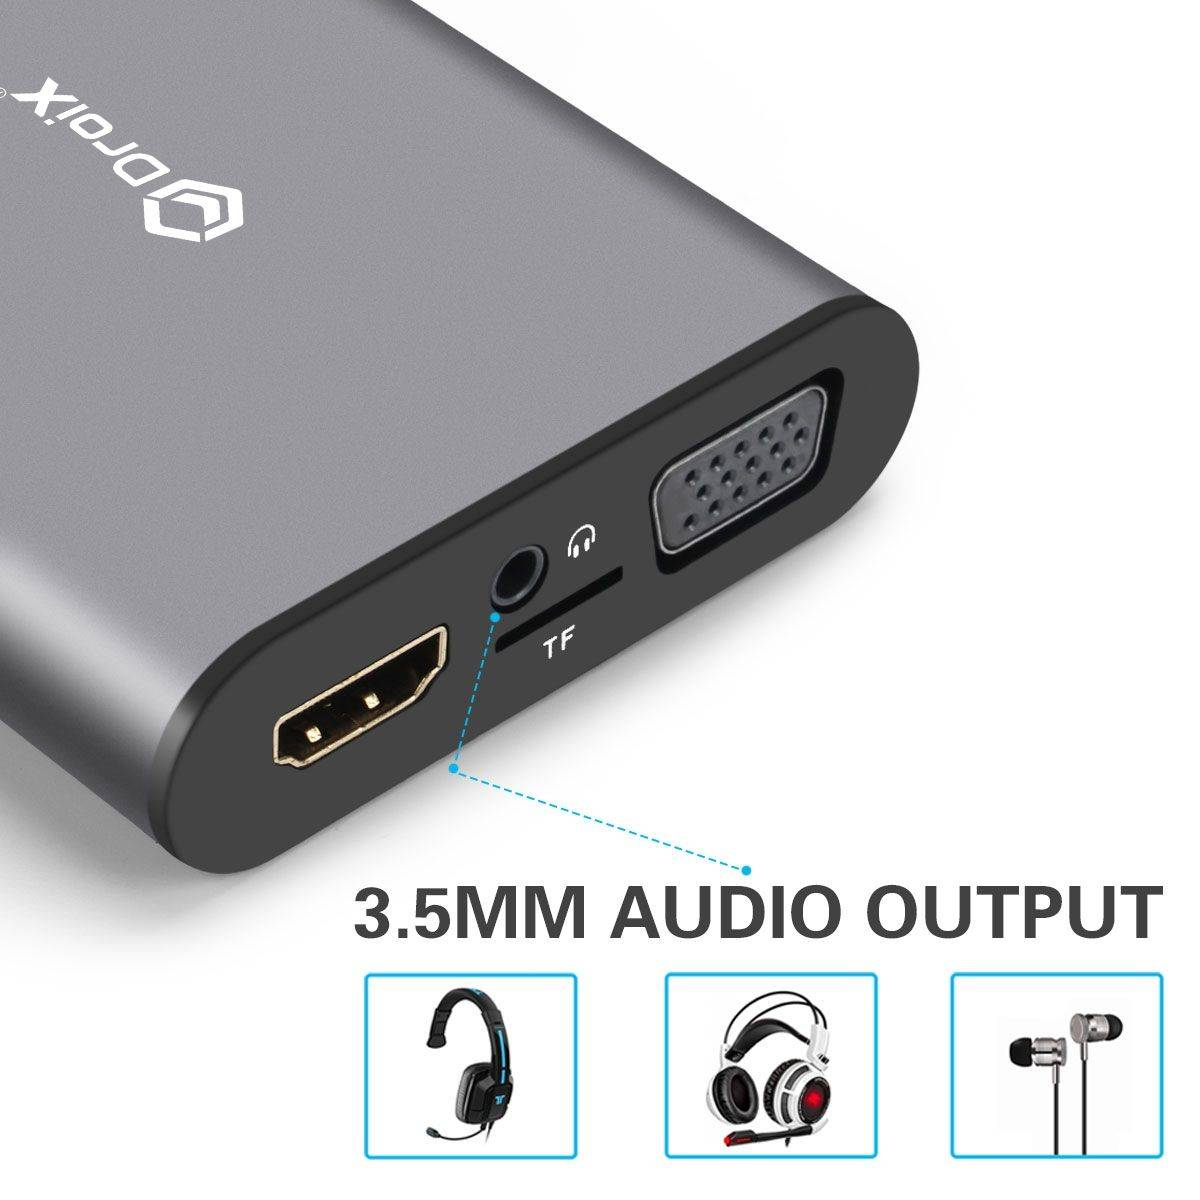 DroiX FX8 USB Type-C Hub Audio Output Port for Speakers,Headphones,Earphones